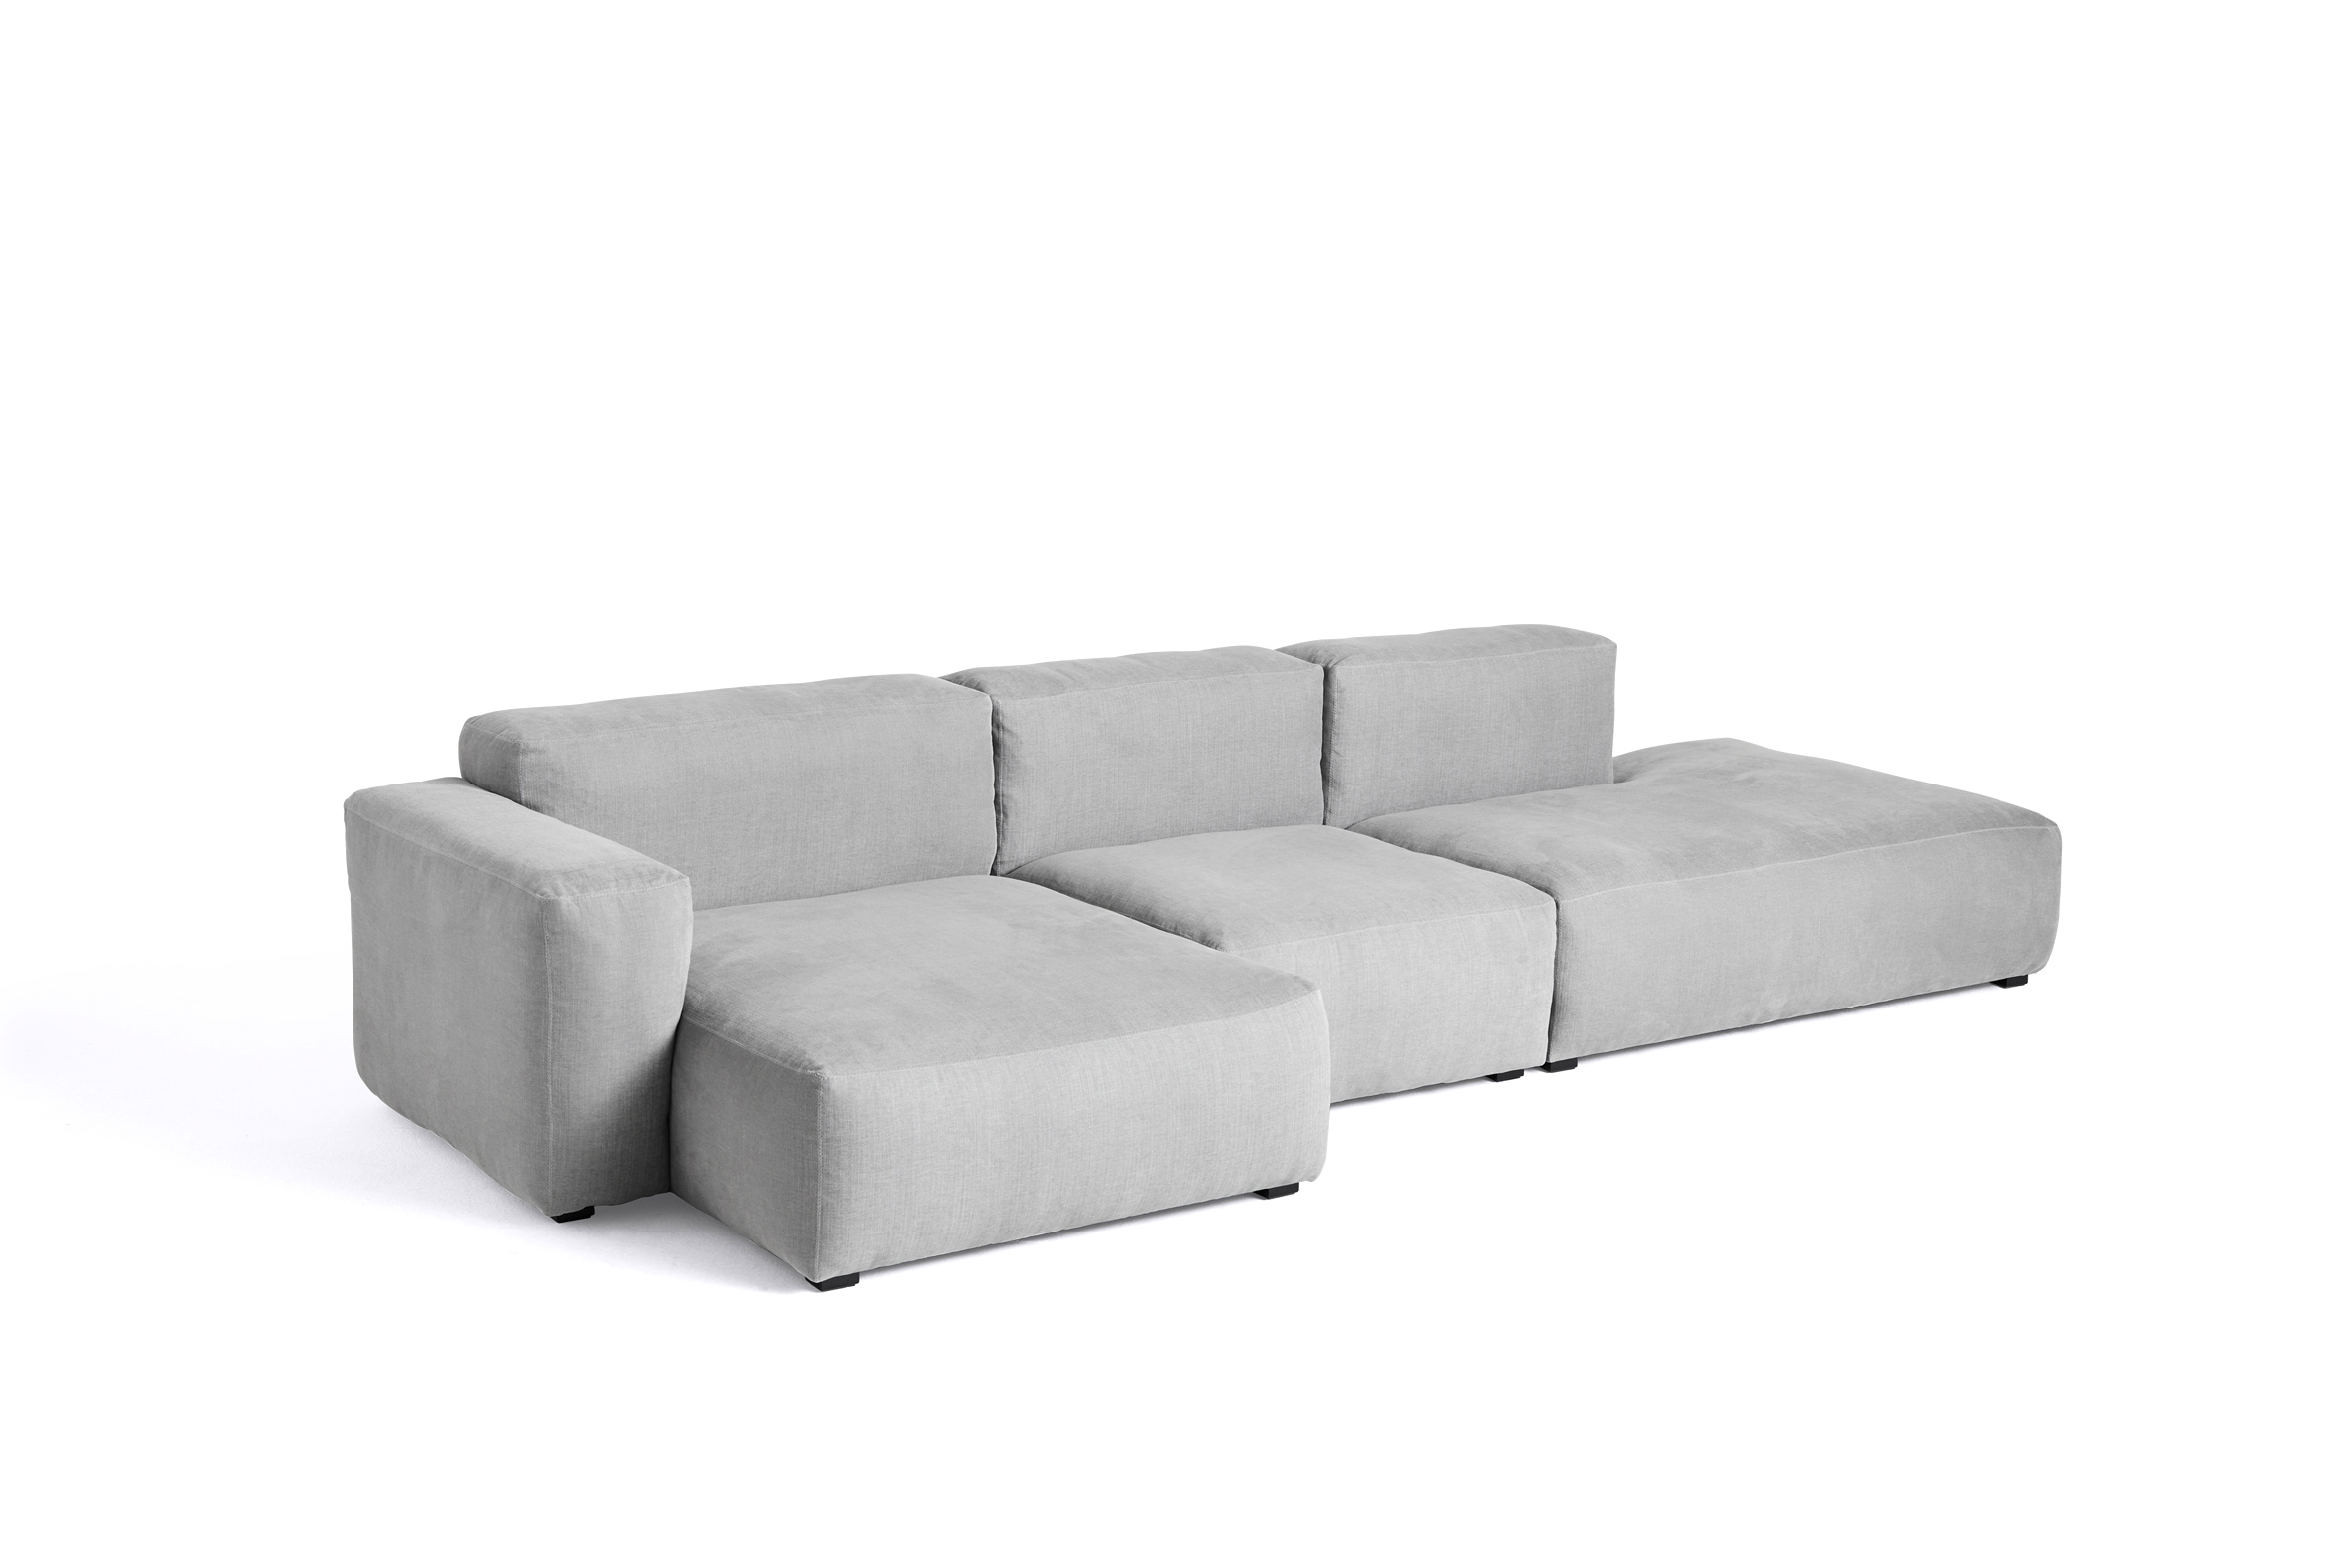 HAY Mags Soft Sofa 3 Sitzer Kombination 4 left low